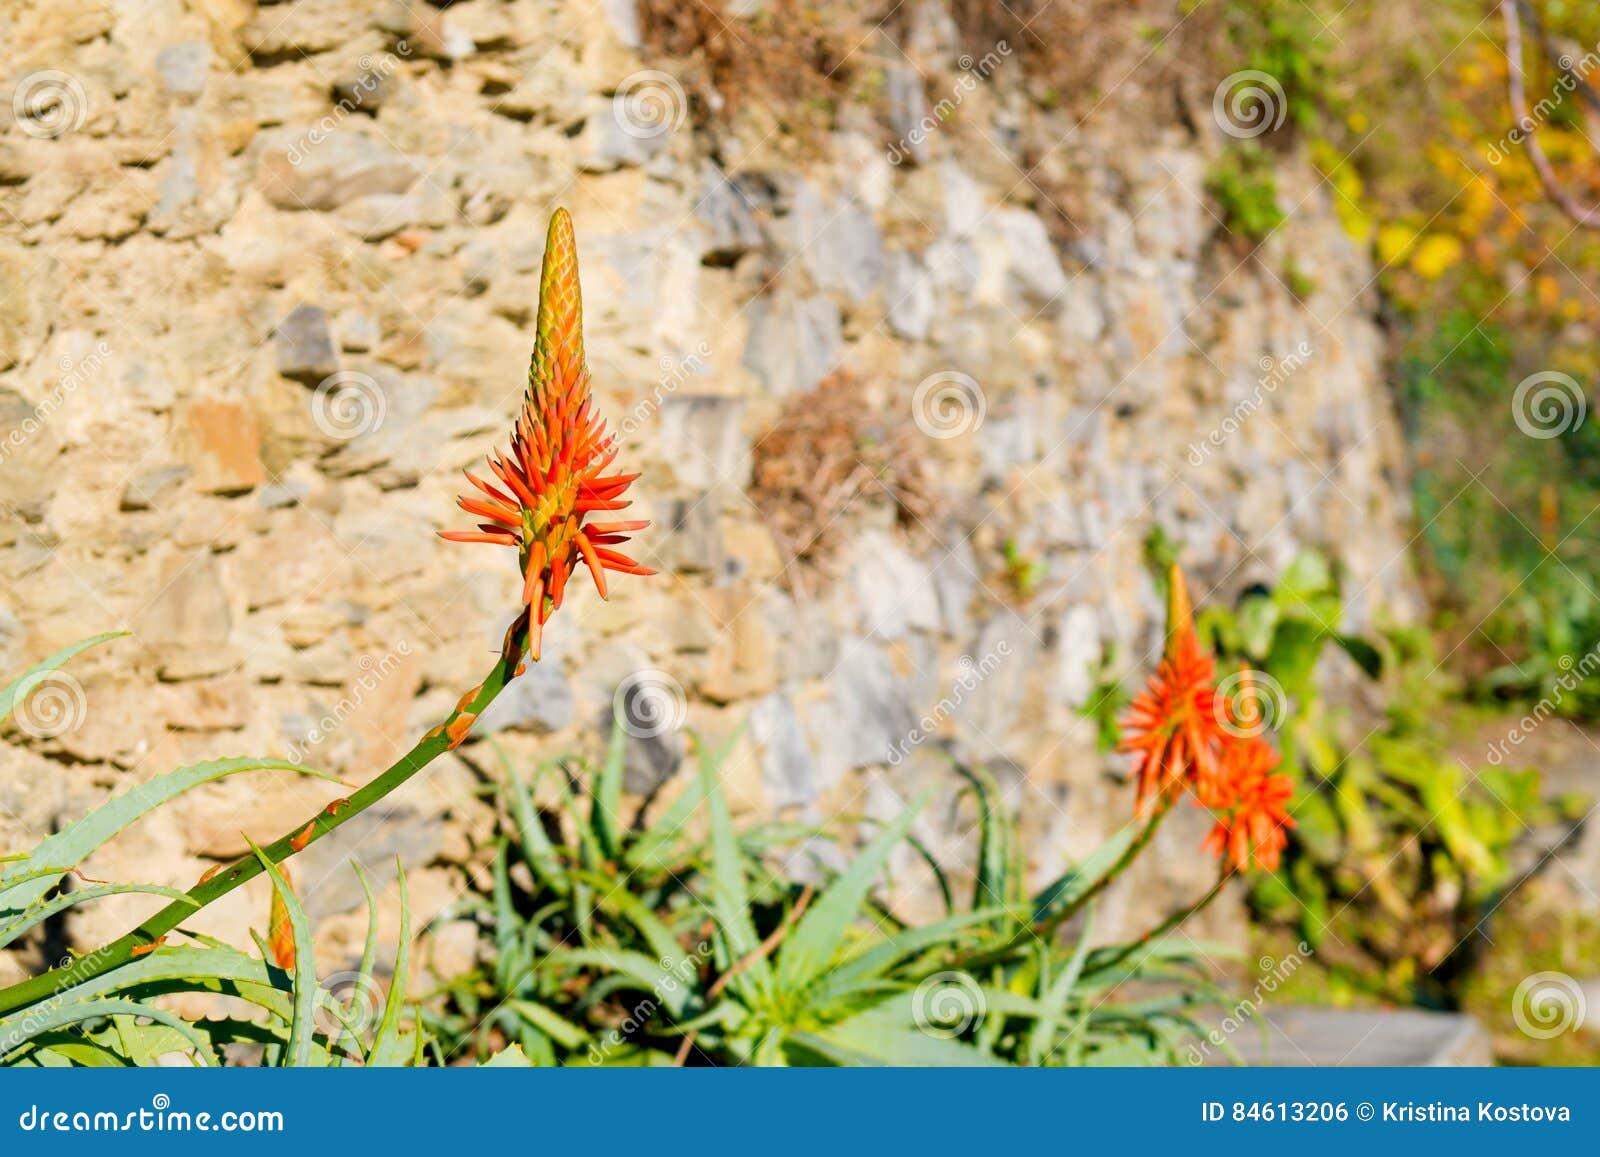 fleur d 39 agave en fleur fin photo stock image du herbe frais 84613206. Black Bedroom Furniture Sets. Home Design Ideas